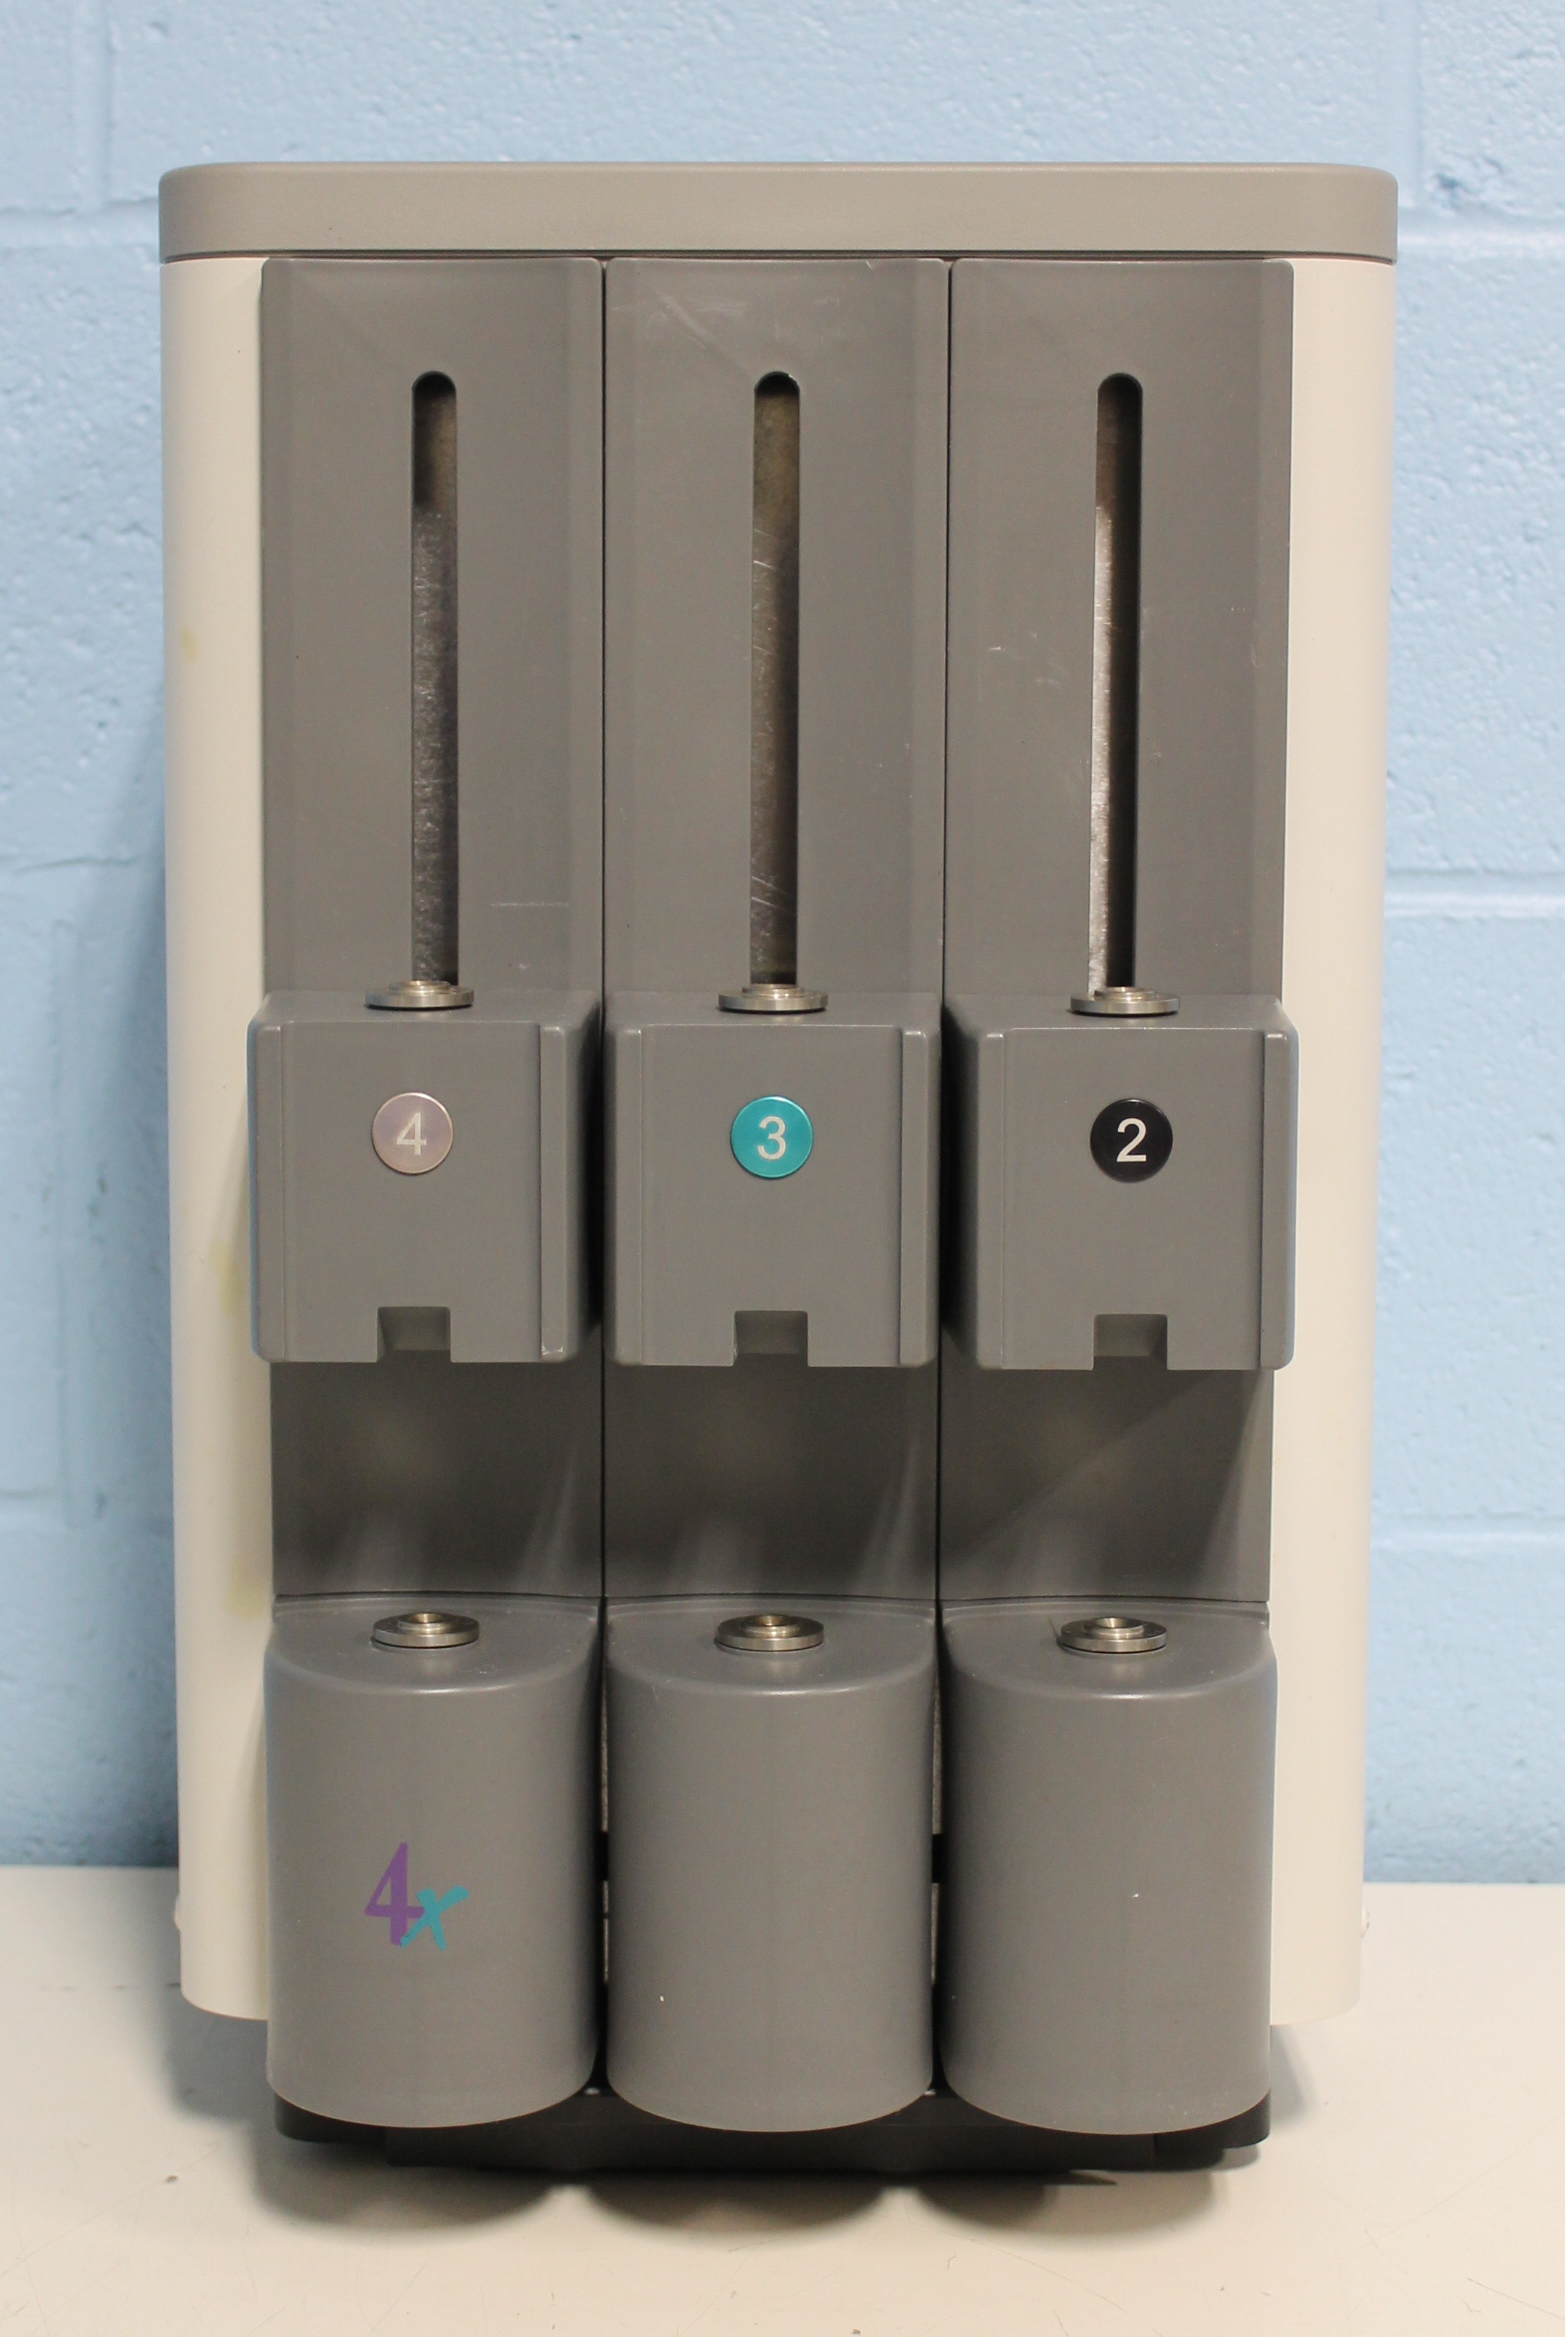 Teledyne Isco 4X Expansion Module Image